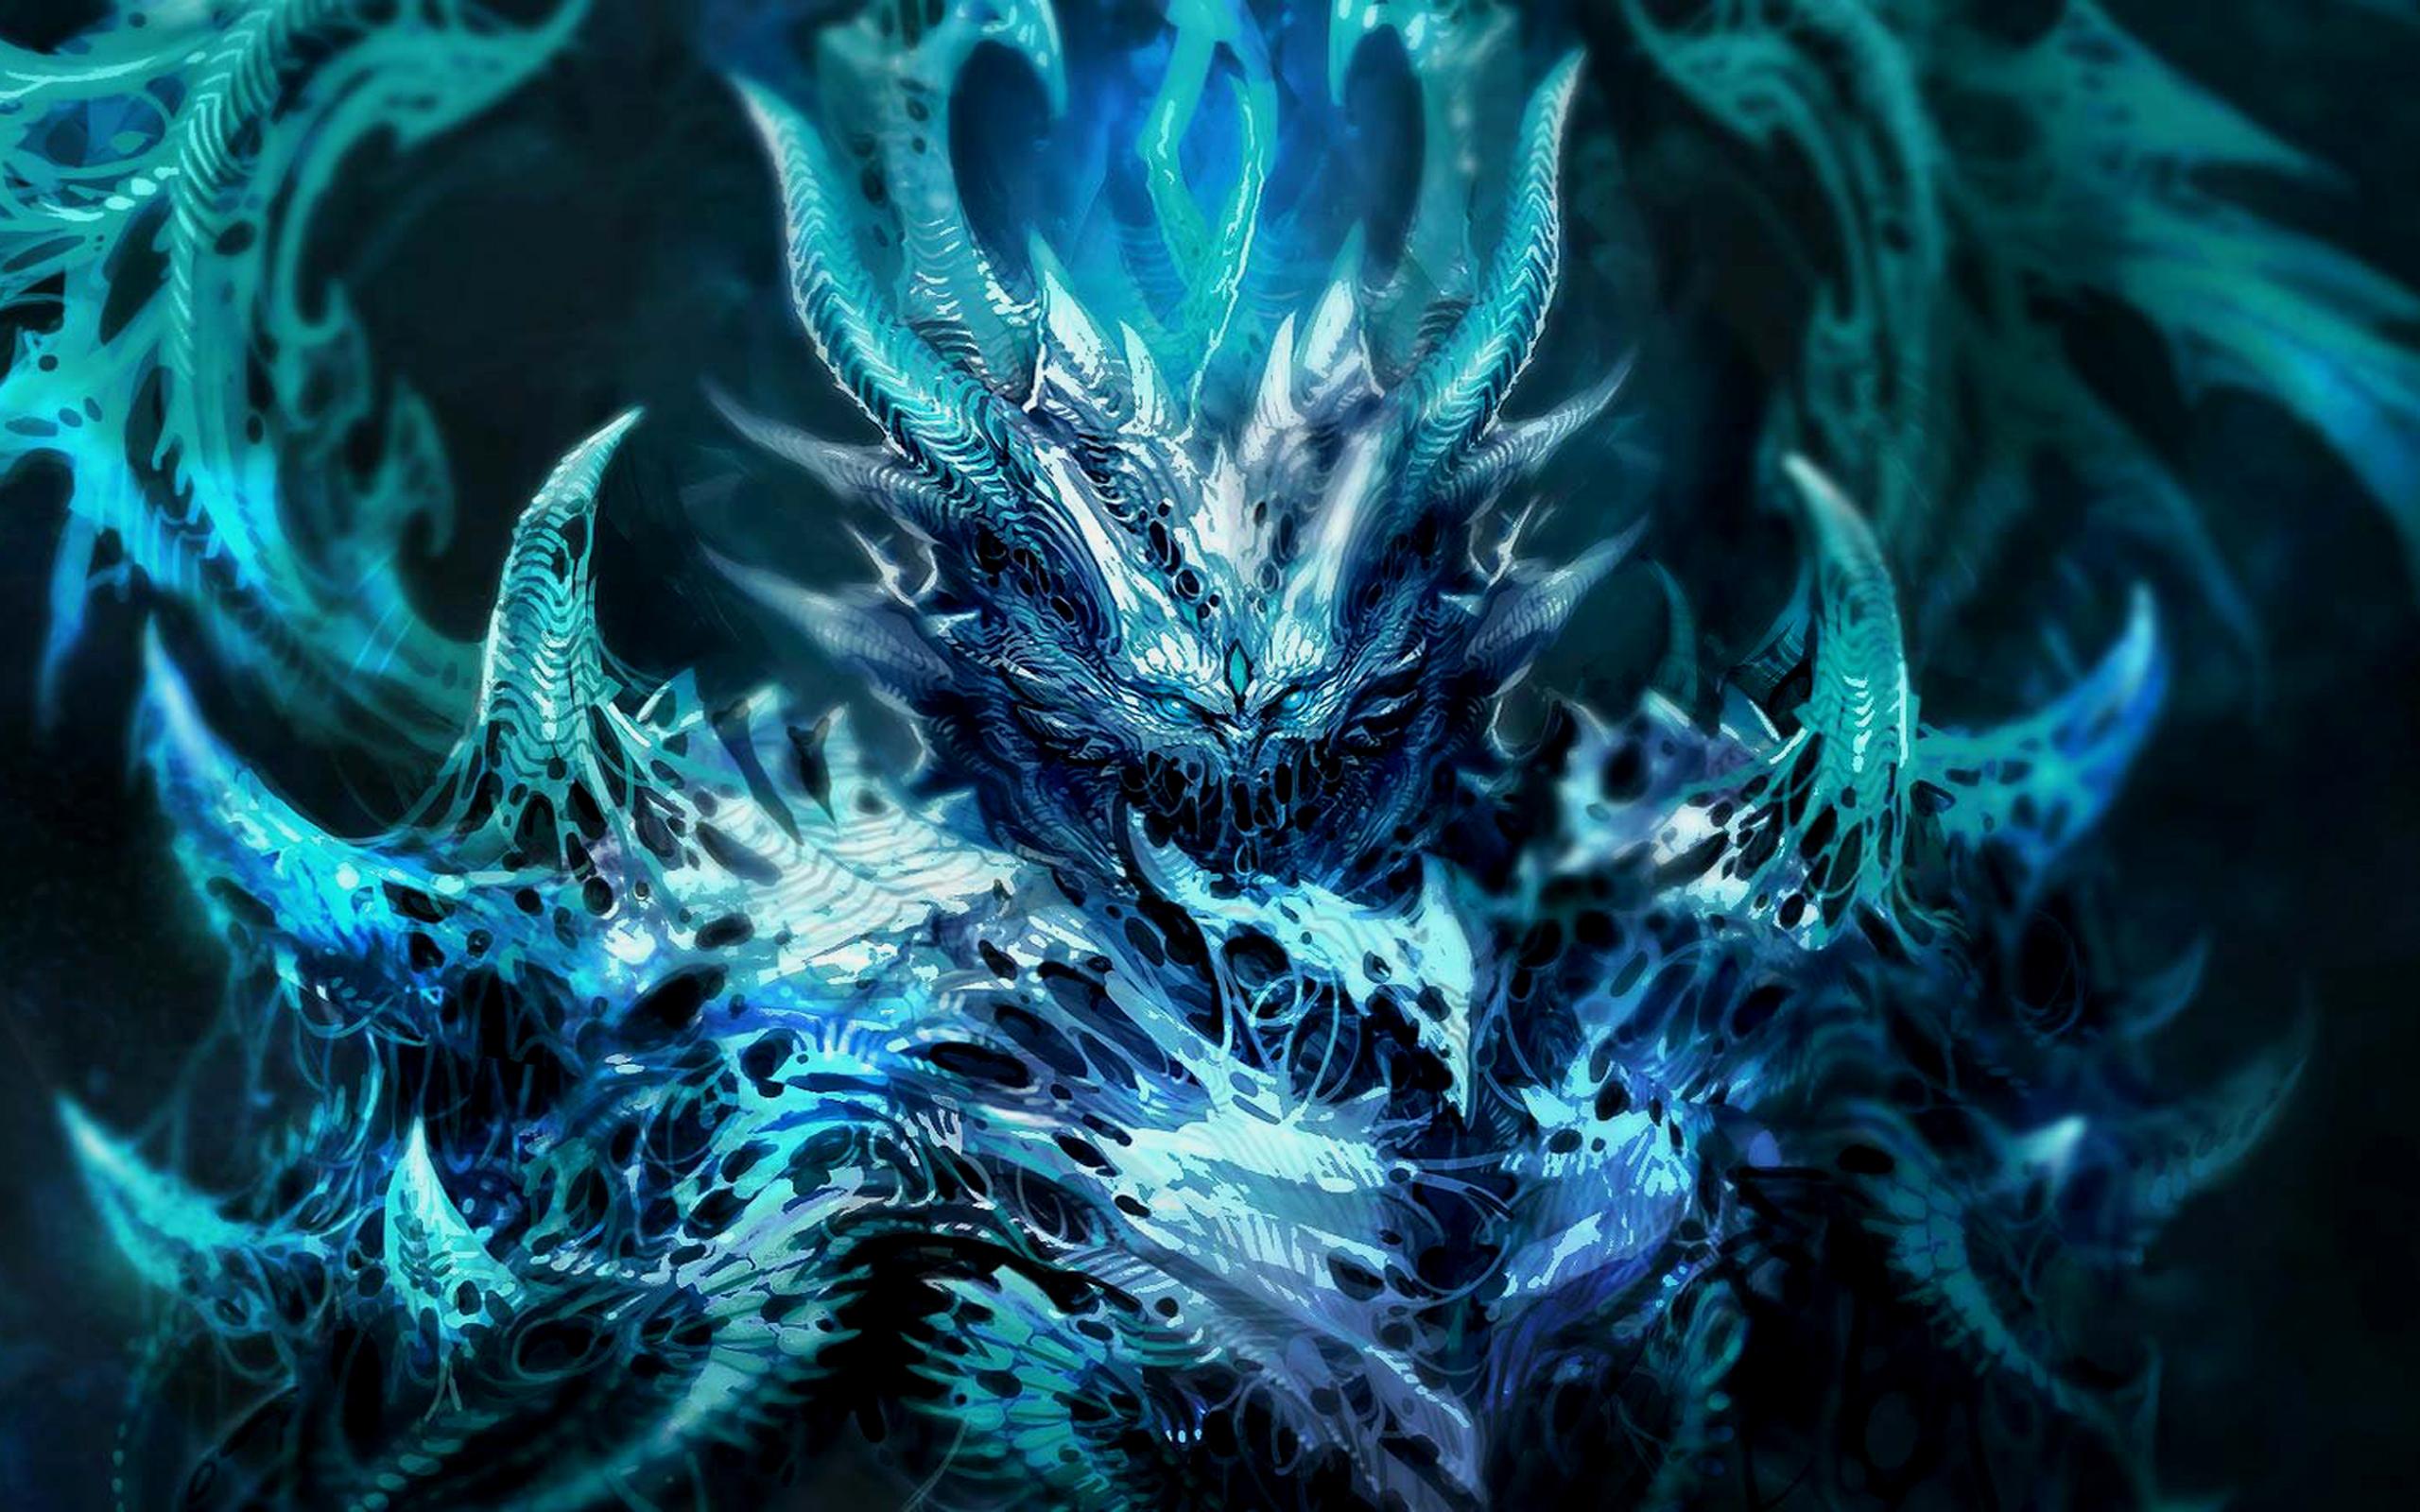 Dark Demon Wallpaper 2560x1600 Dark Demon 2560x1600